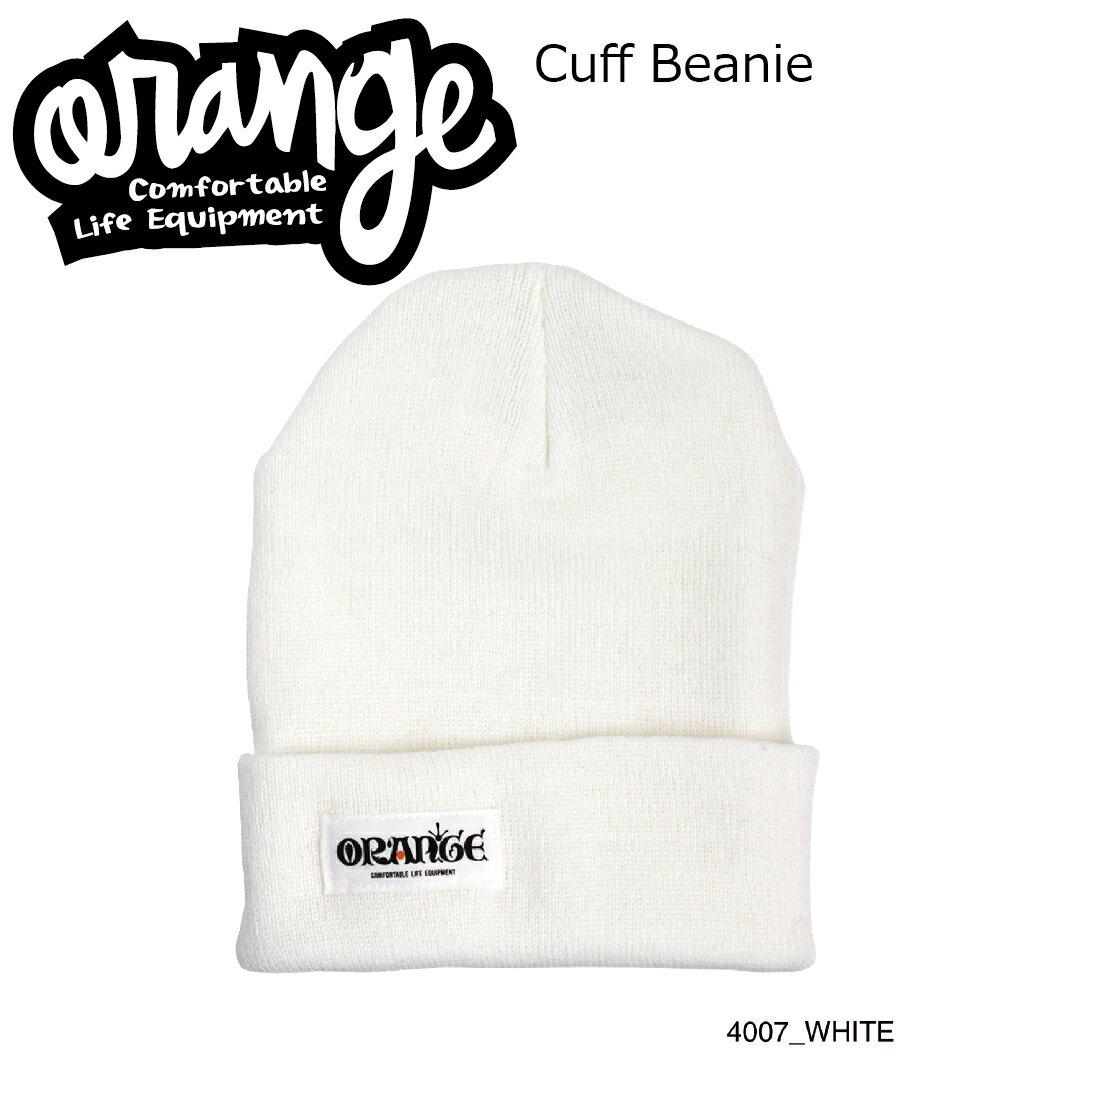 Oran'ge Cuff Beanie 4007 WHITE オレンジ カフ ビーニー ニットキャップ 2つ折り